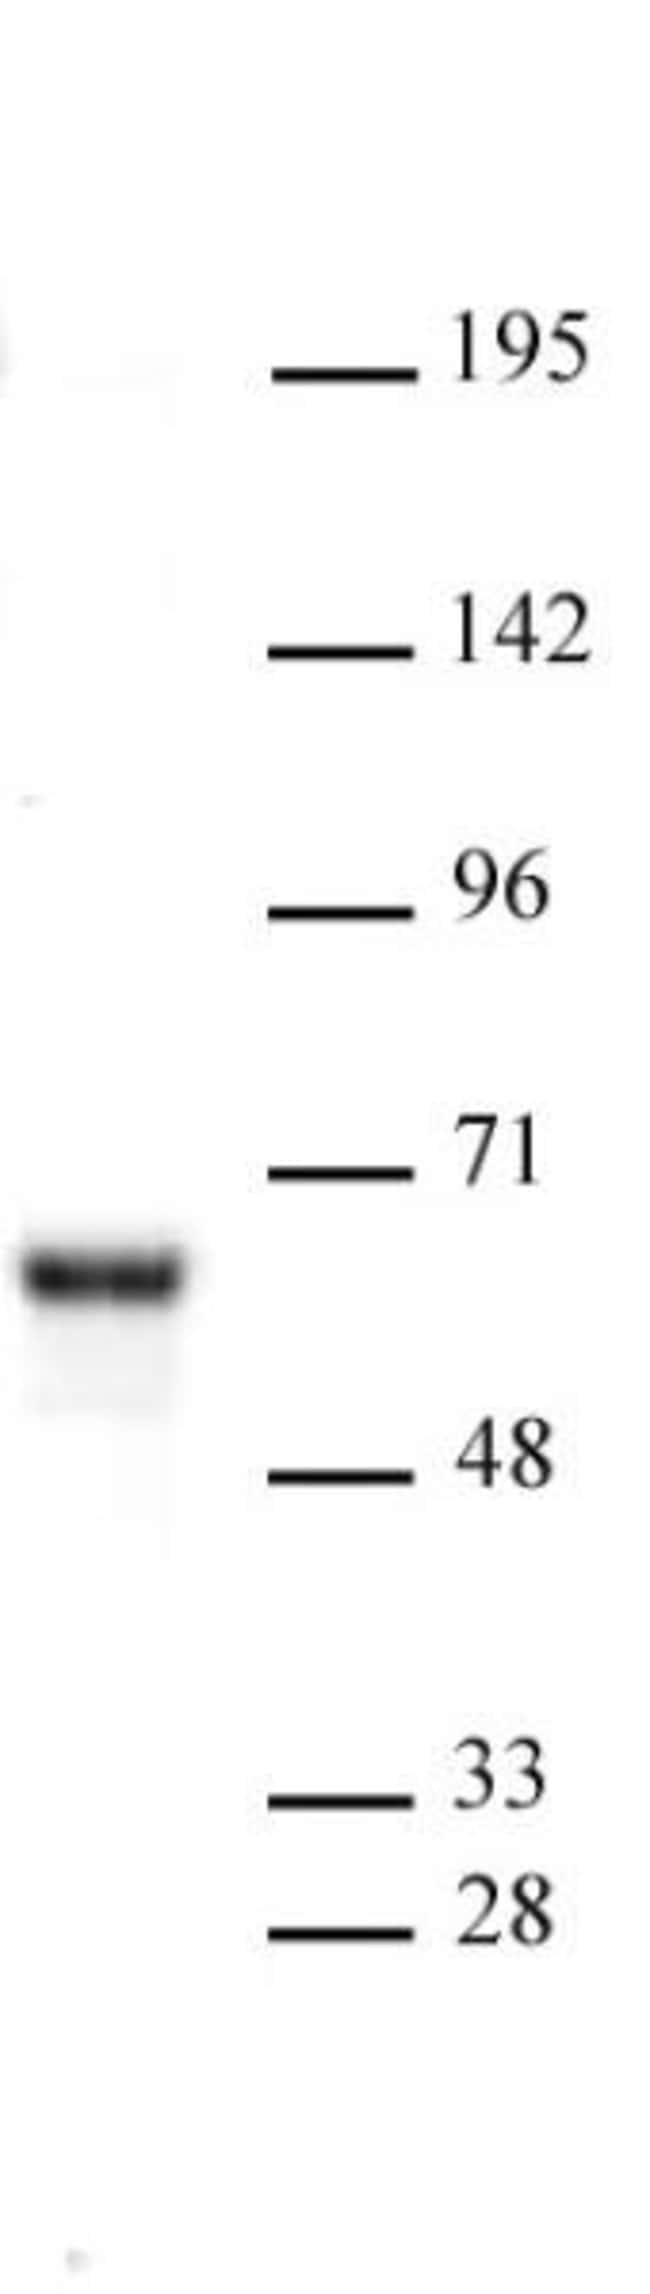 NR0B1 Rabbit anti-Human, Unconjugated, Polyclonal, Active Motif:Antibodies:Primary